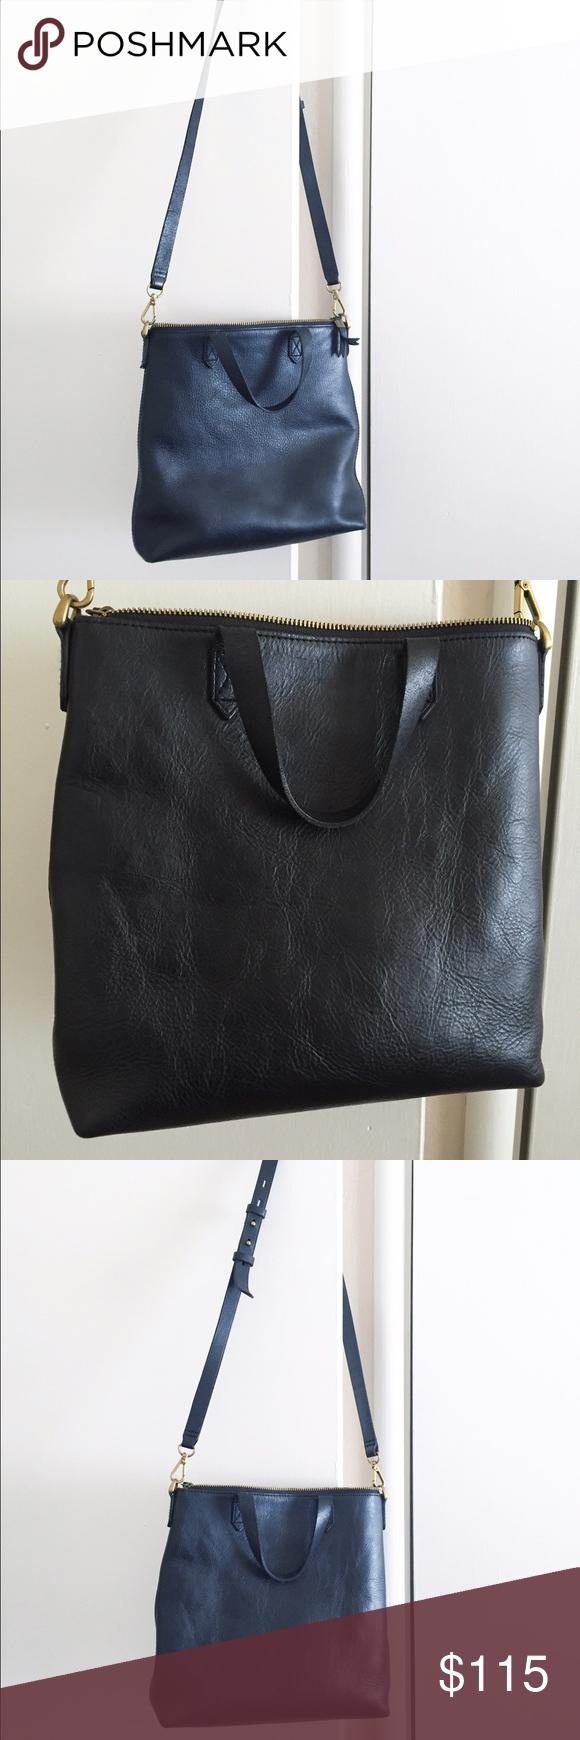 54fd73cda842 Madewell Mini Transport Tote A genuine-leather zip-top bag is made super  versatile